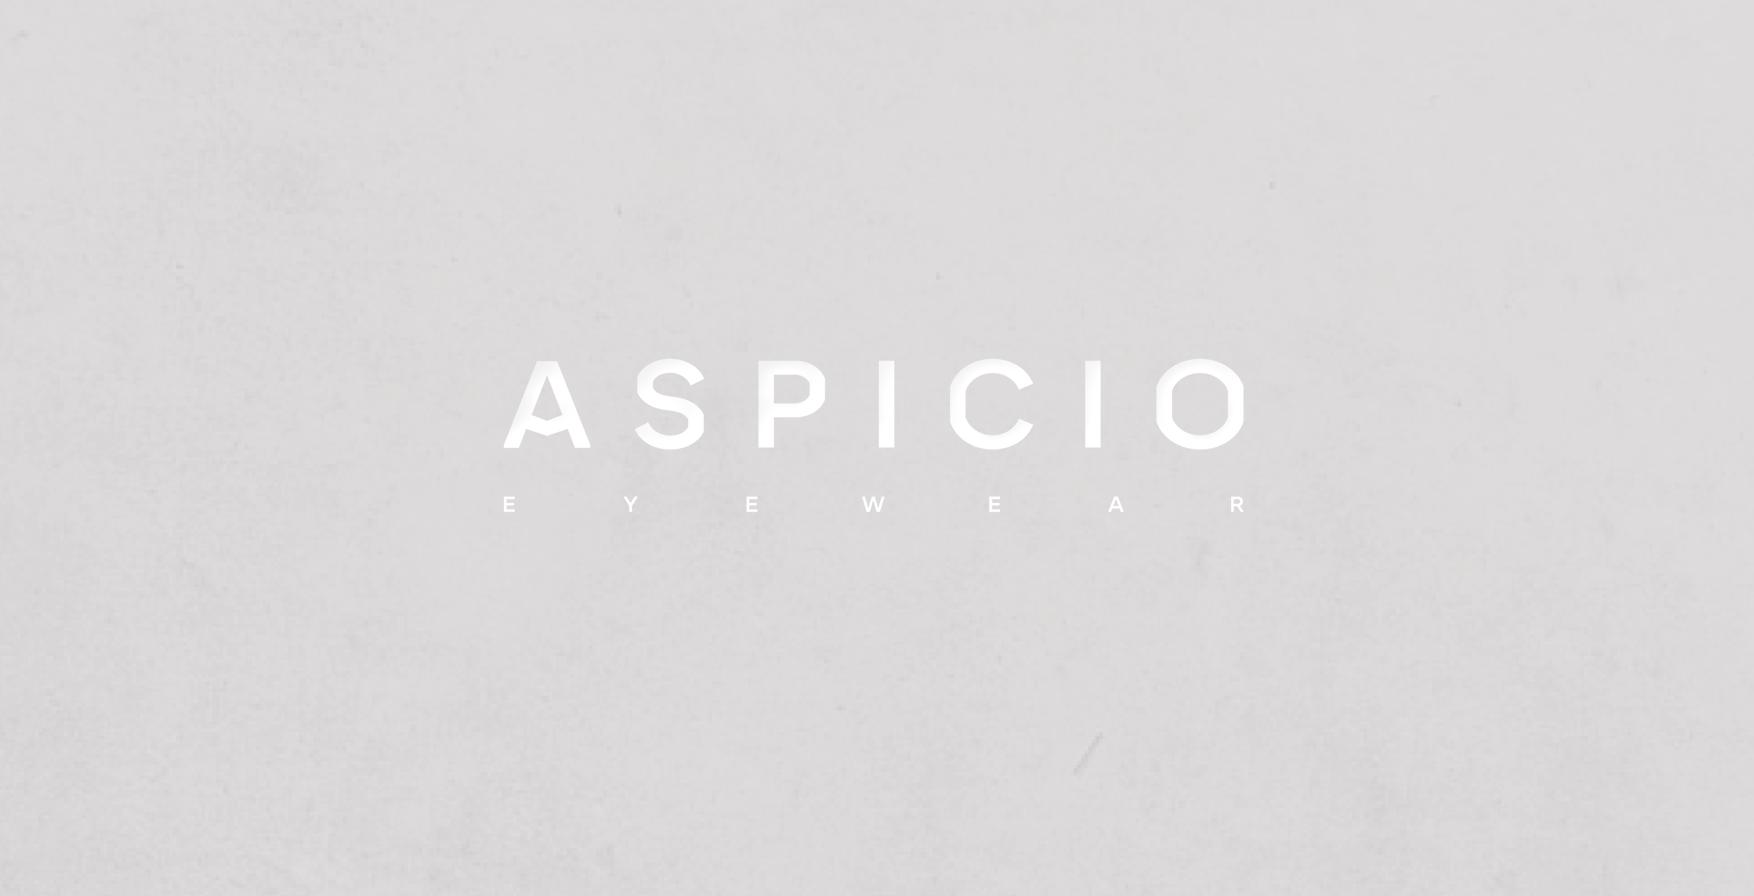 GrafiskManual_Aspicio_cut